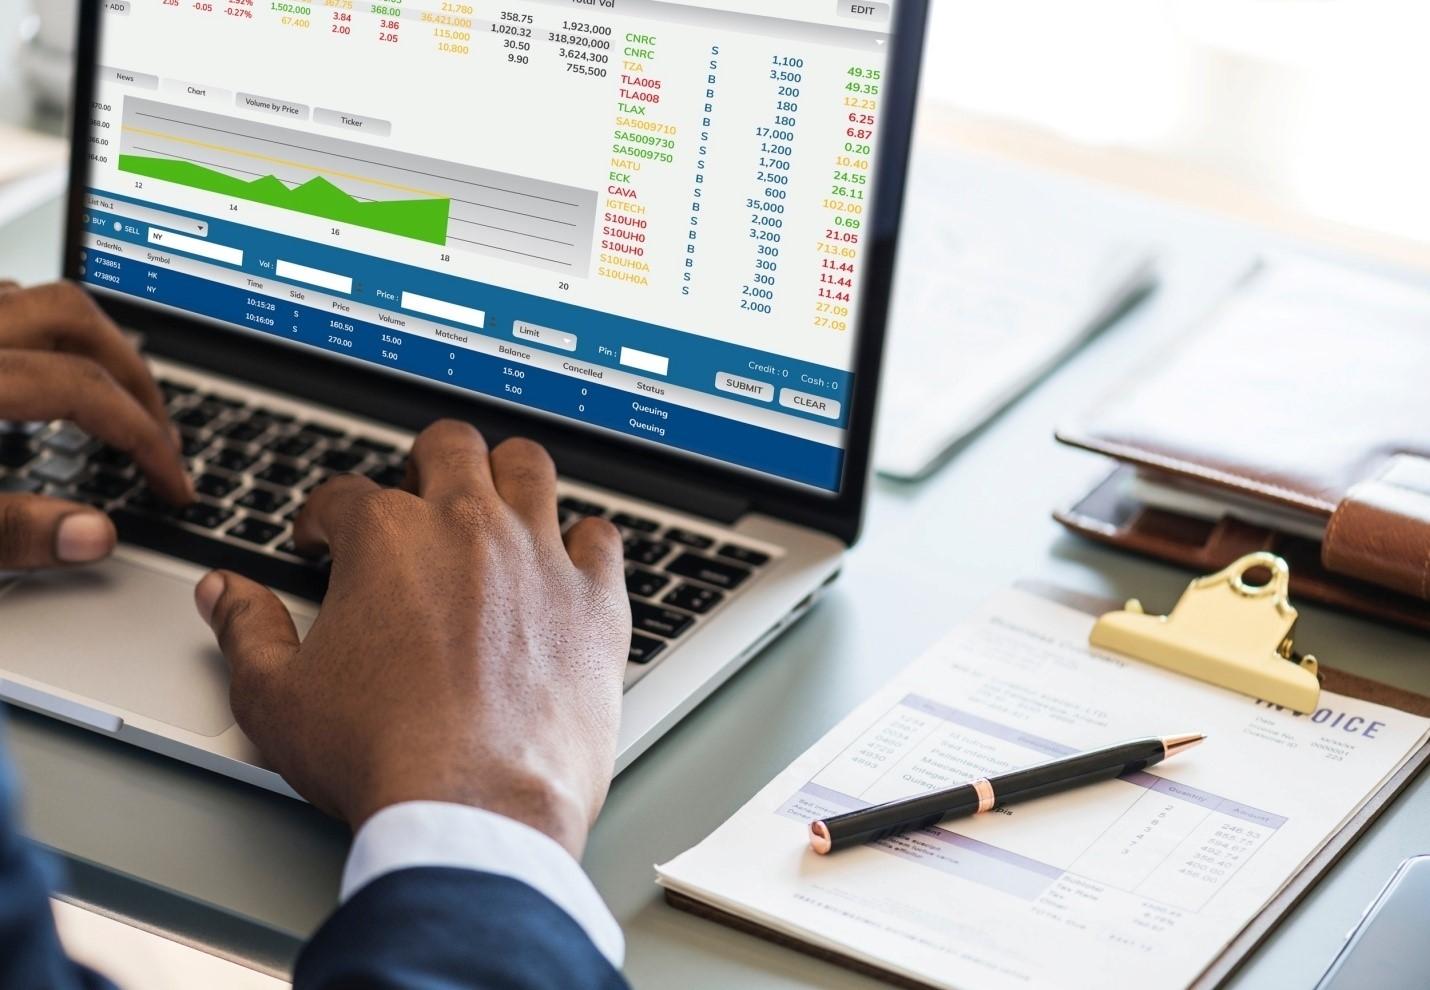 4 Ways Loan Management Software Improves the Mort